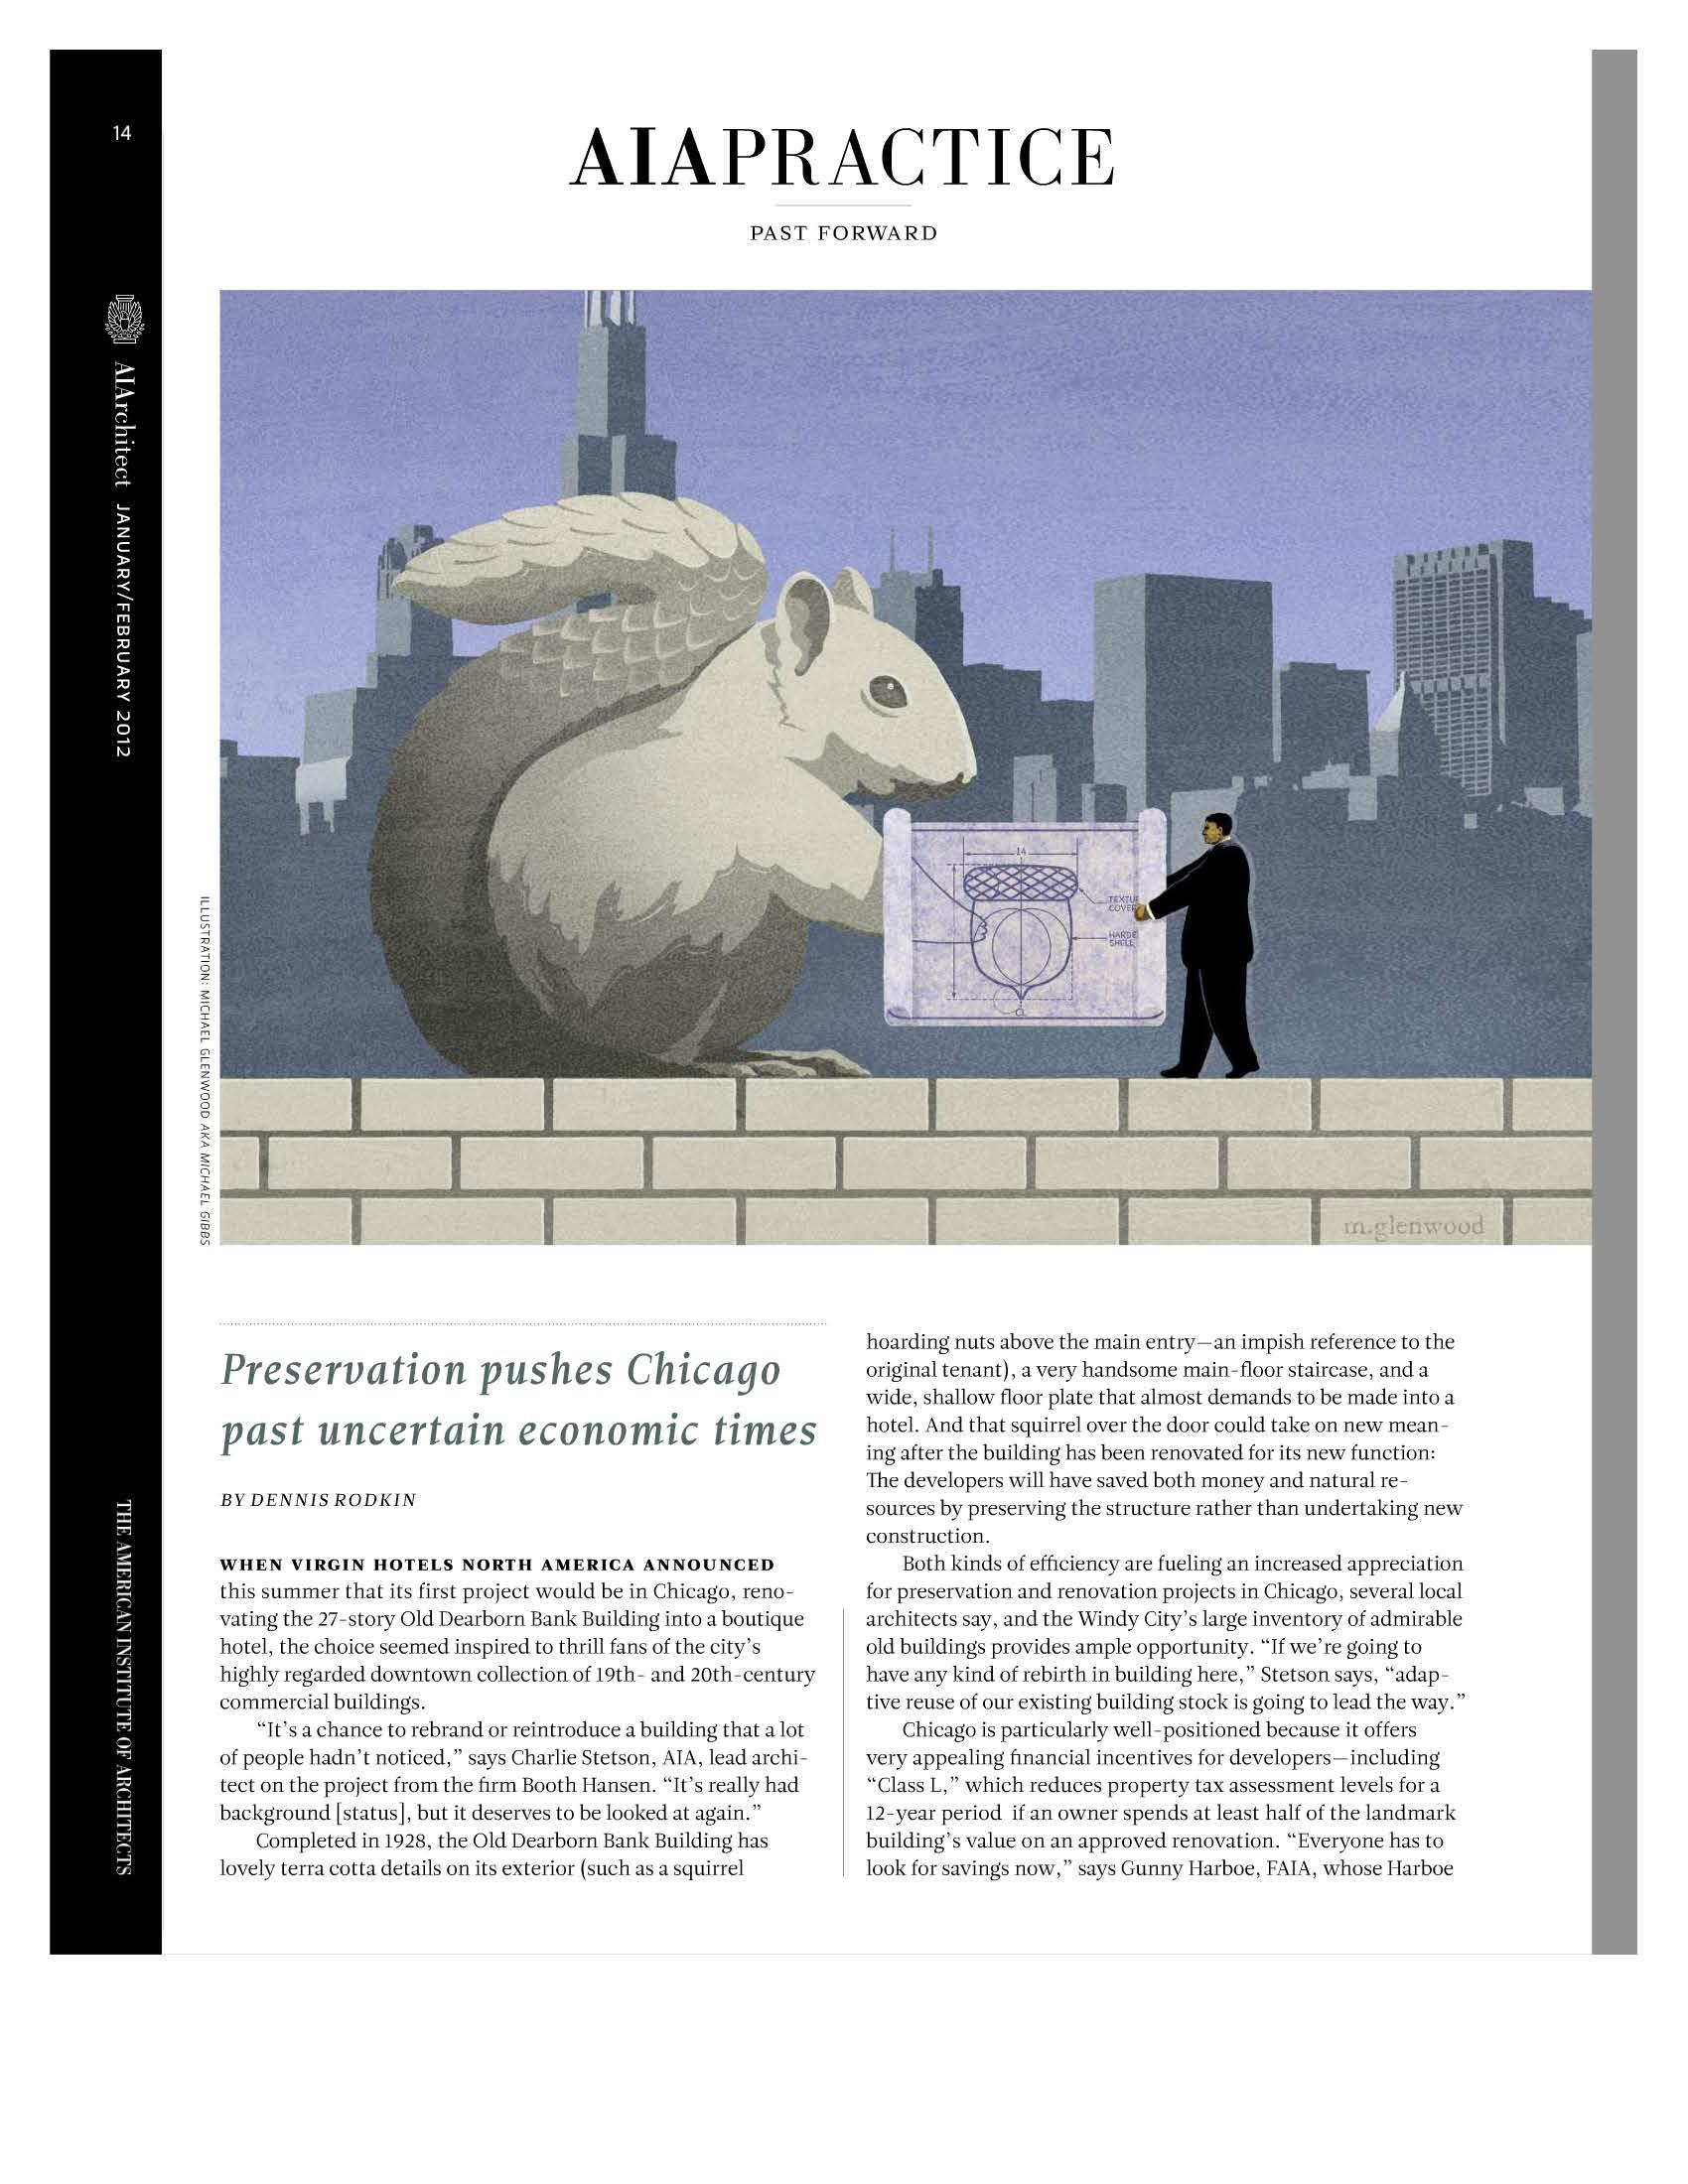 Chicago Preservation_Page_1.jpg